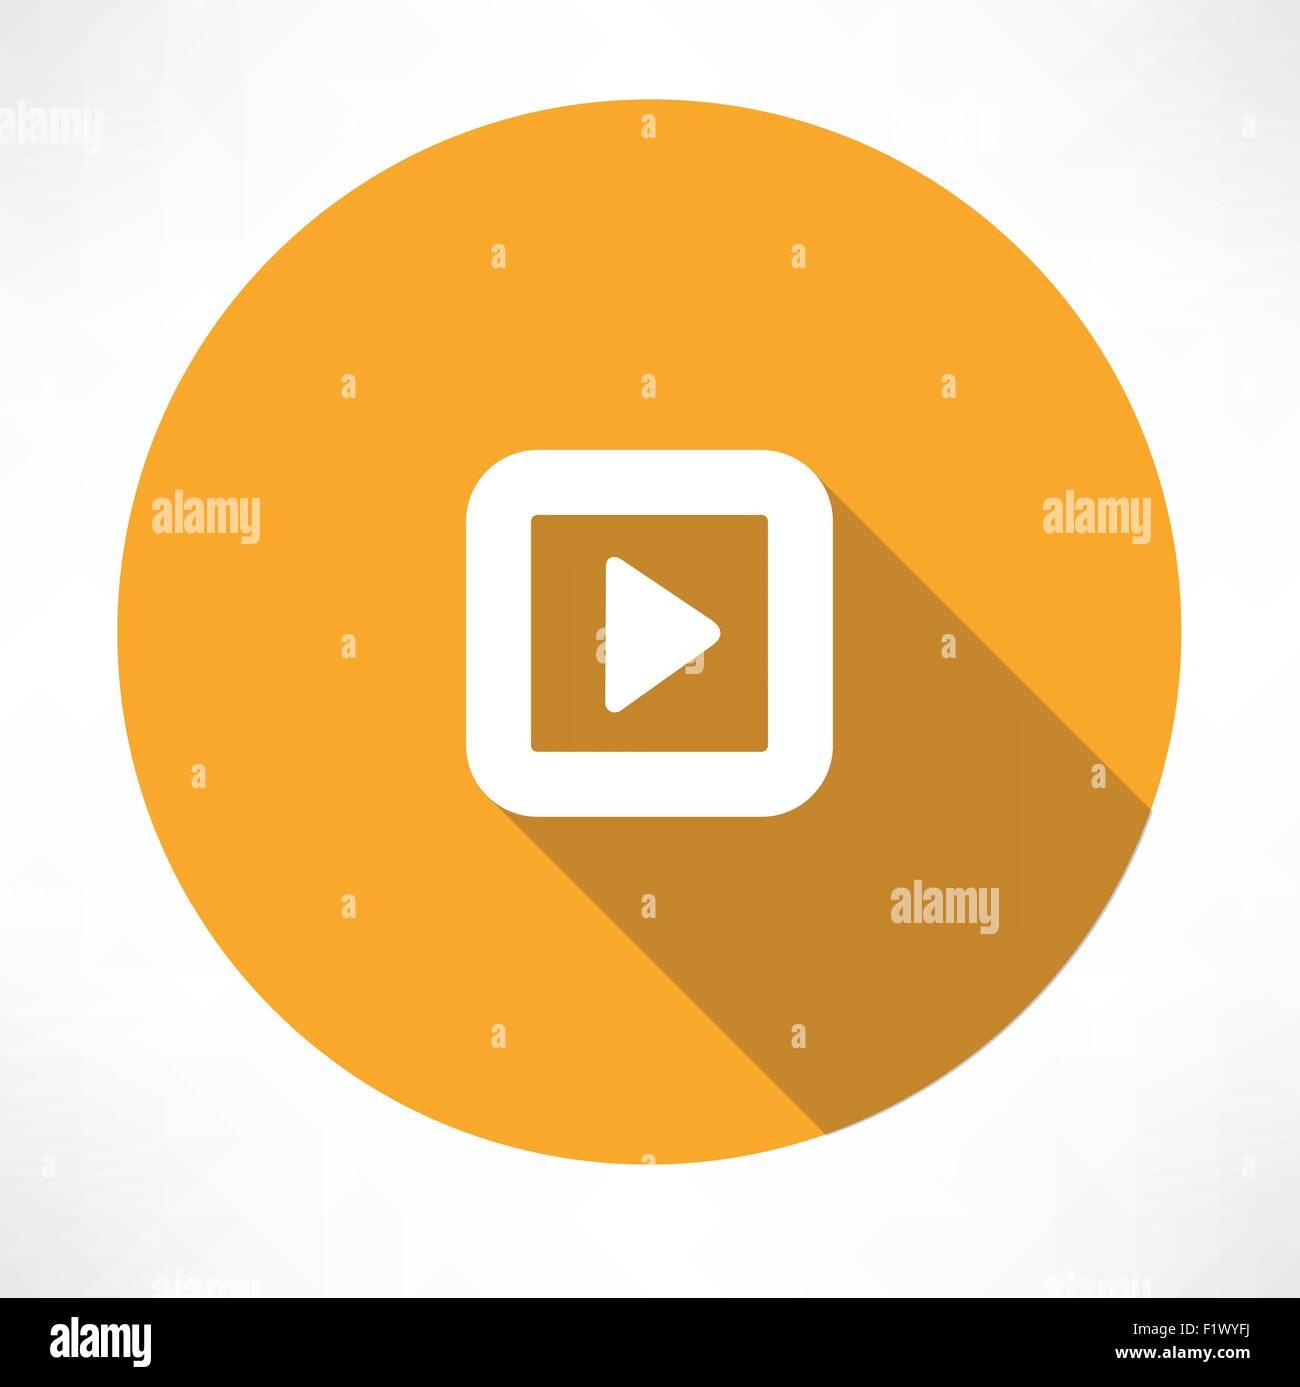 Play icon. Flat modern style vector illustration - Stock Vector